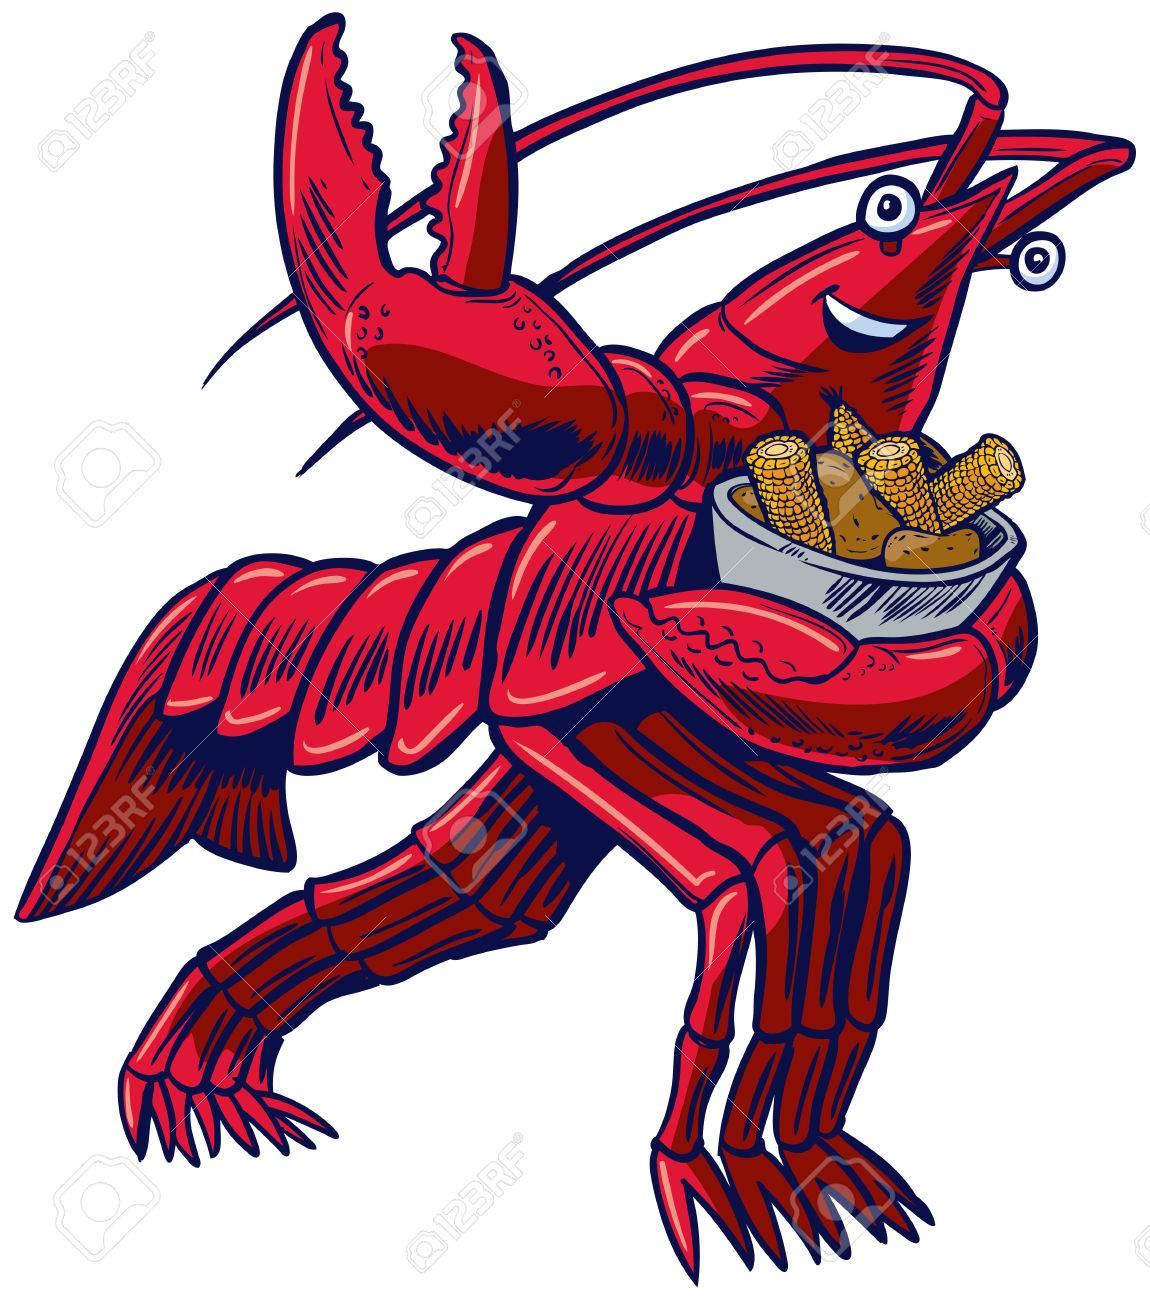 vector cartoon clip art illustration of a crayfish crawfish